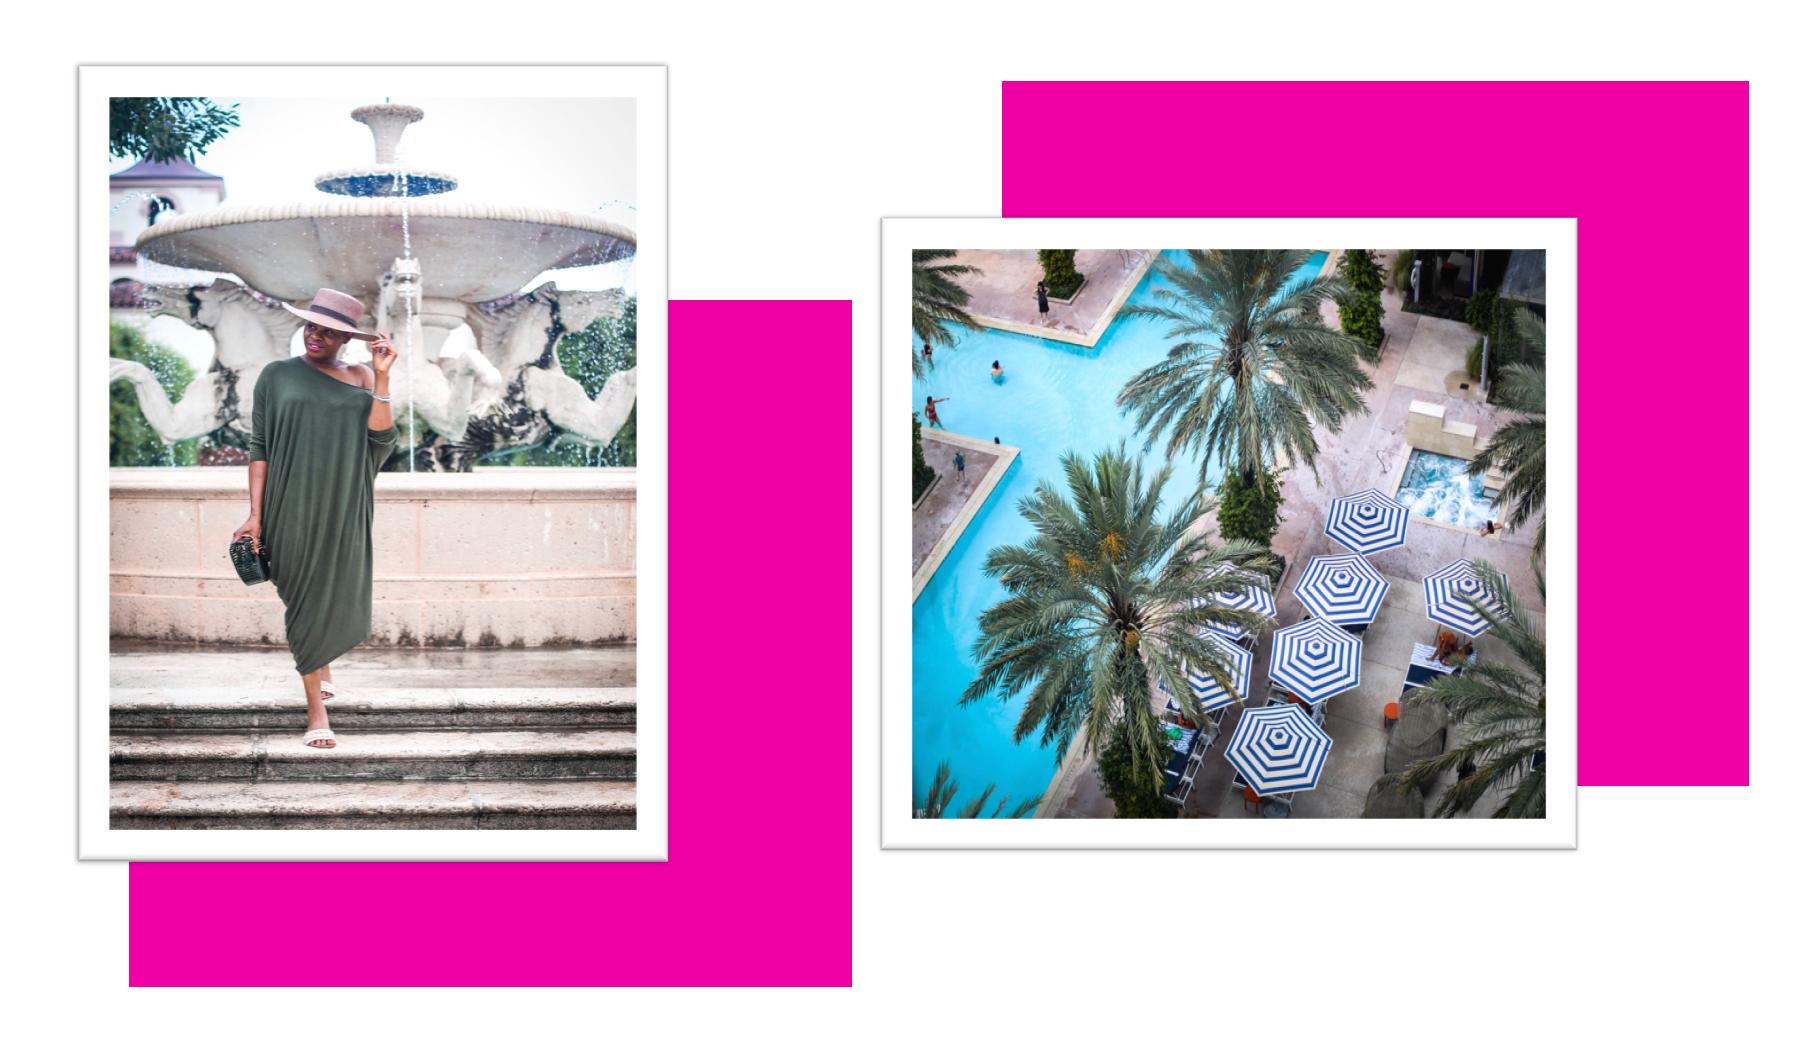 travel to West Palm Beach